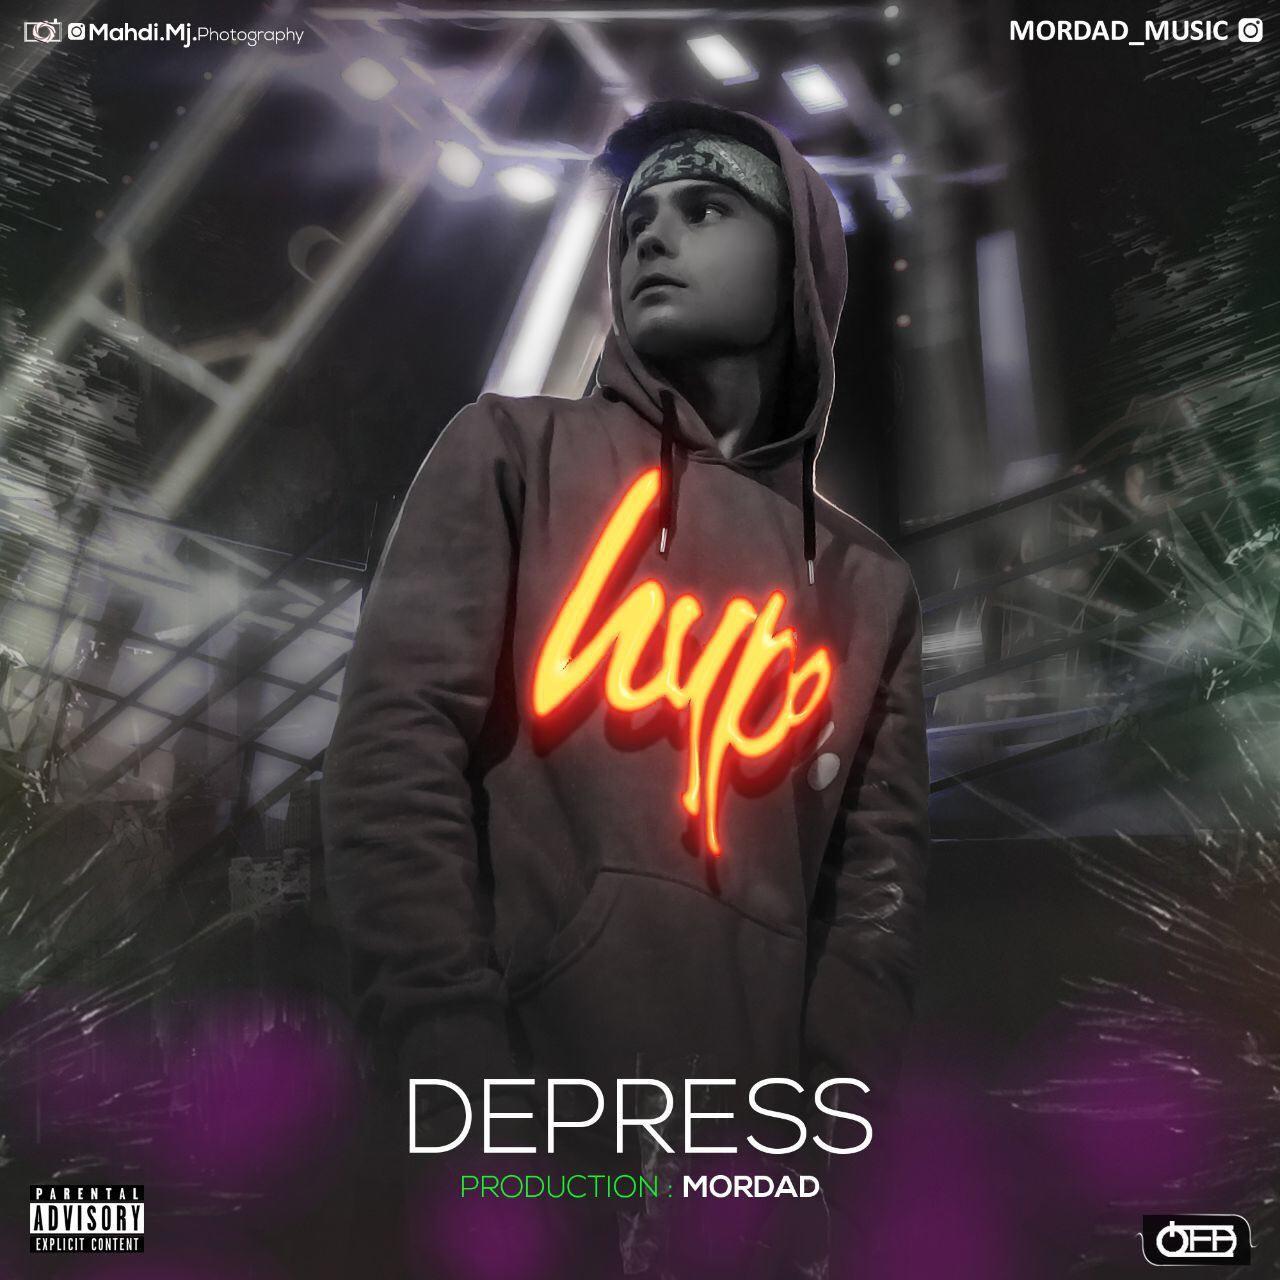 Mordad - Depress